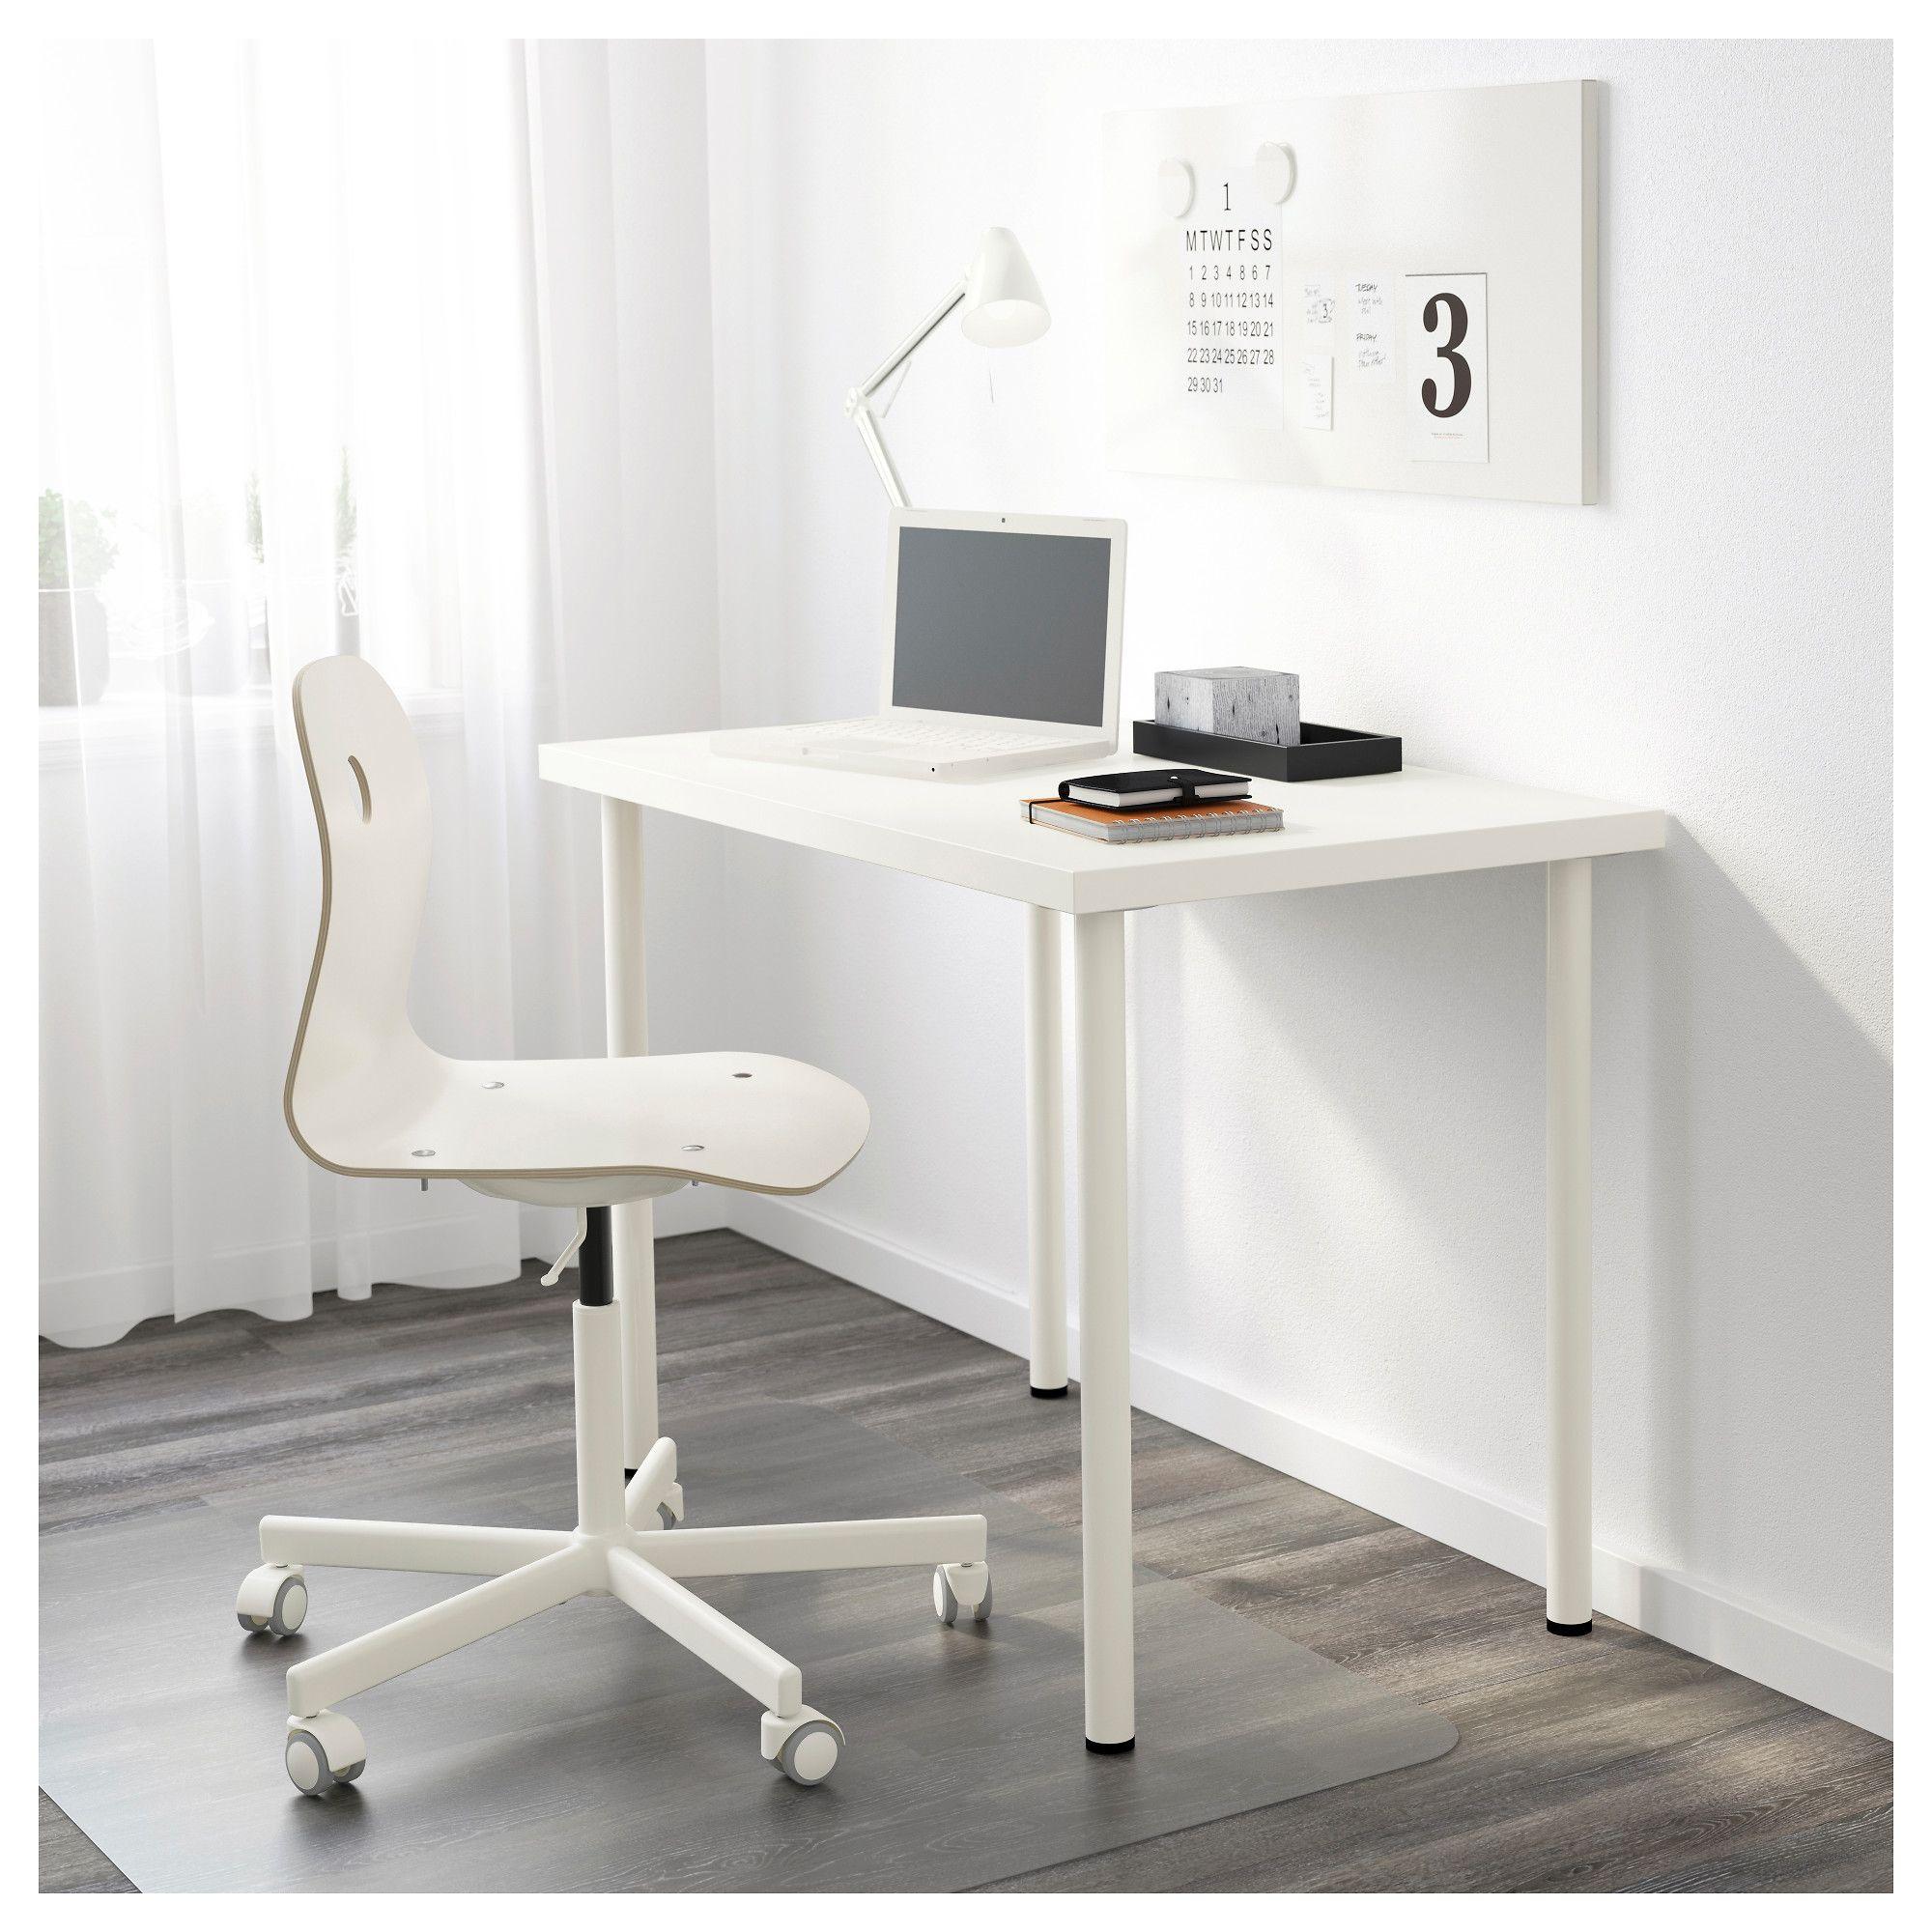 Linnmon Adils White Table 100x60 Cm Ikea Linnmon Table Top Ikea Linnmon Desk Ikea